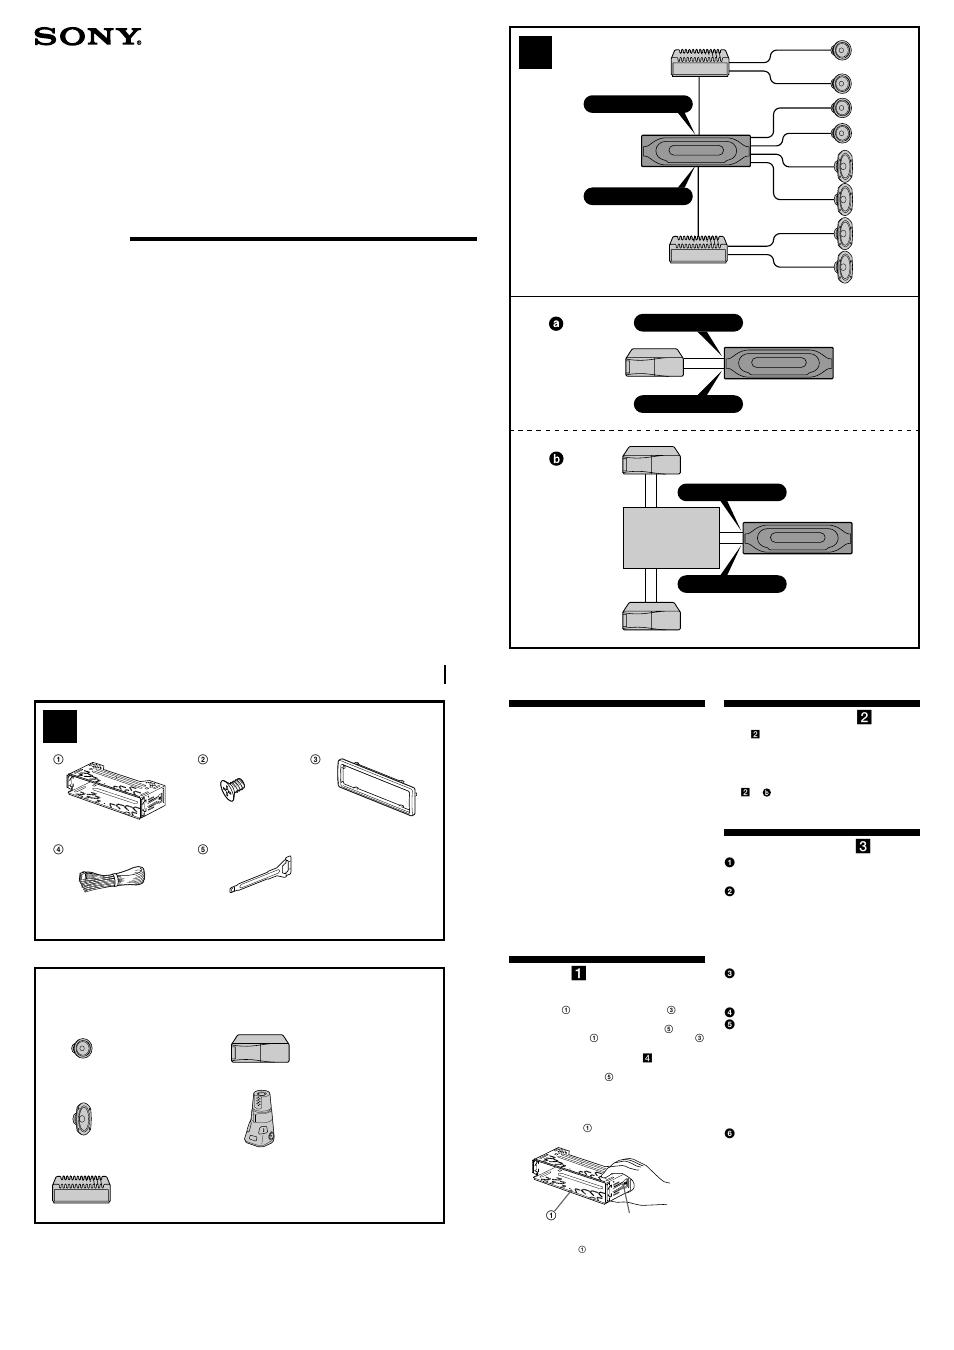 medium resolution of sony cdx mp40 wiring diagram